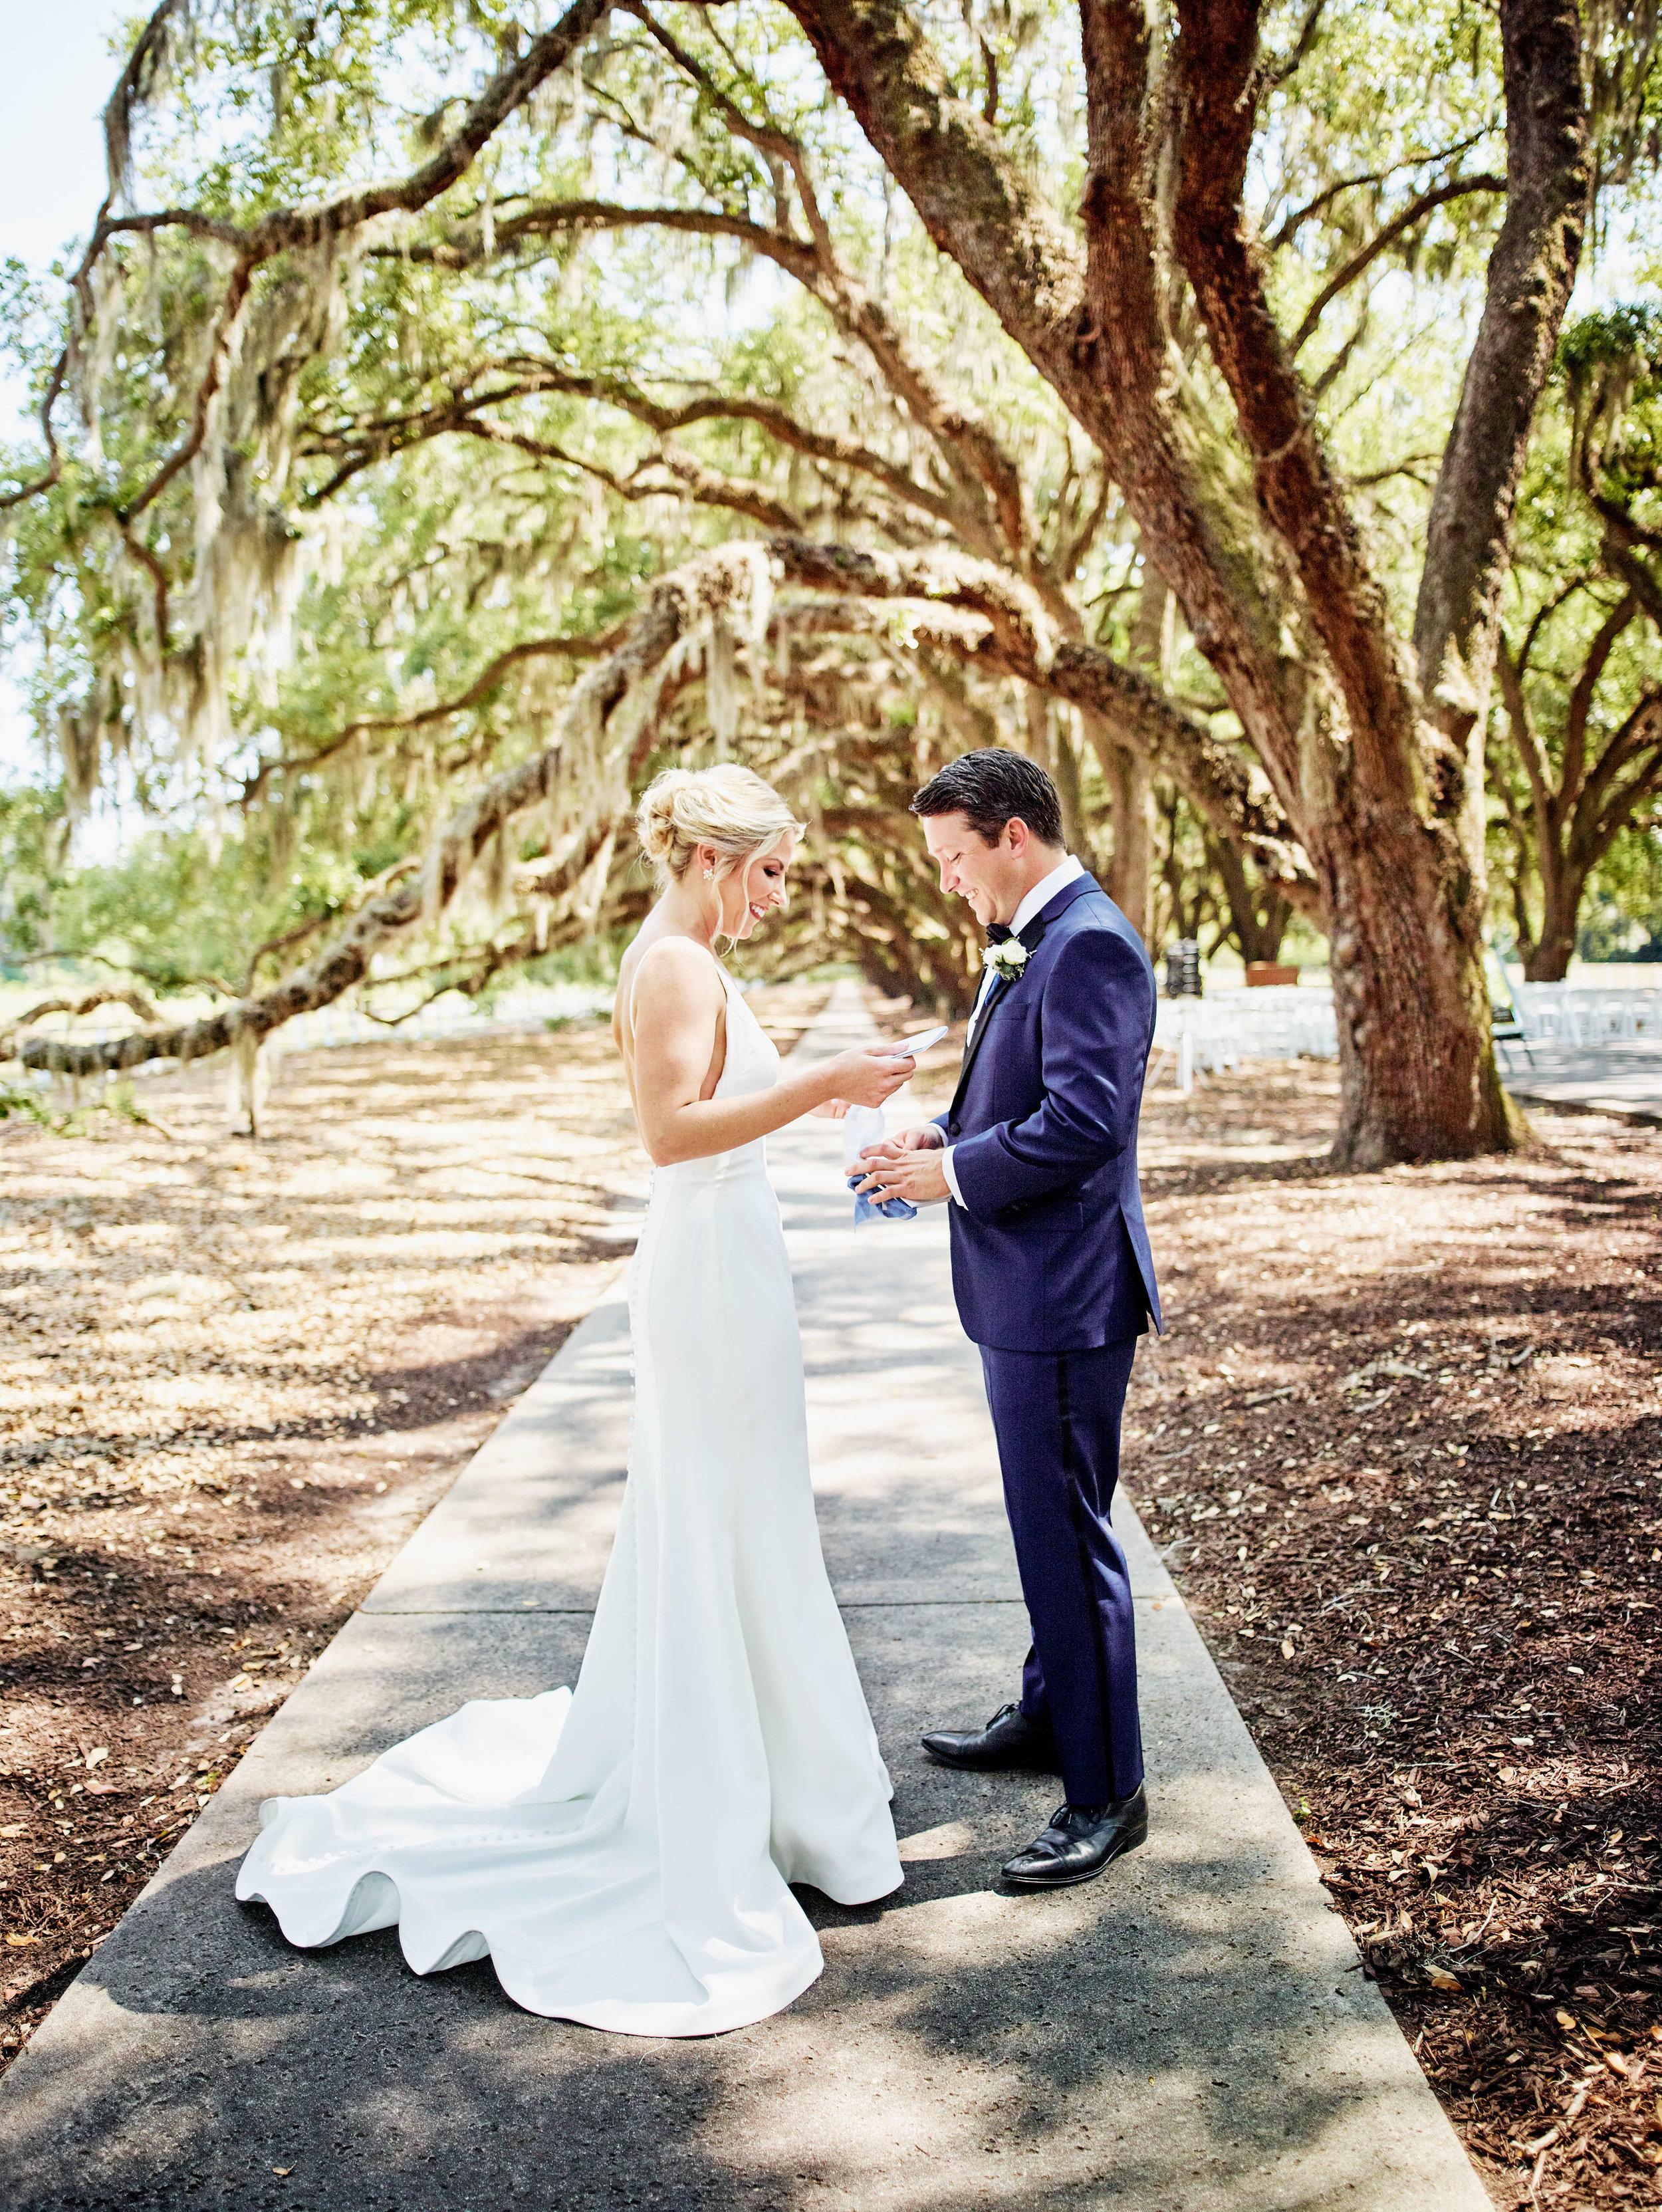 annie-and-greg-wedding-belfair-plantation-ivory-and-beau-savannah-wedding-planner-savannah-wedding-southern-wedding-classic-timeless-wedding.jpg